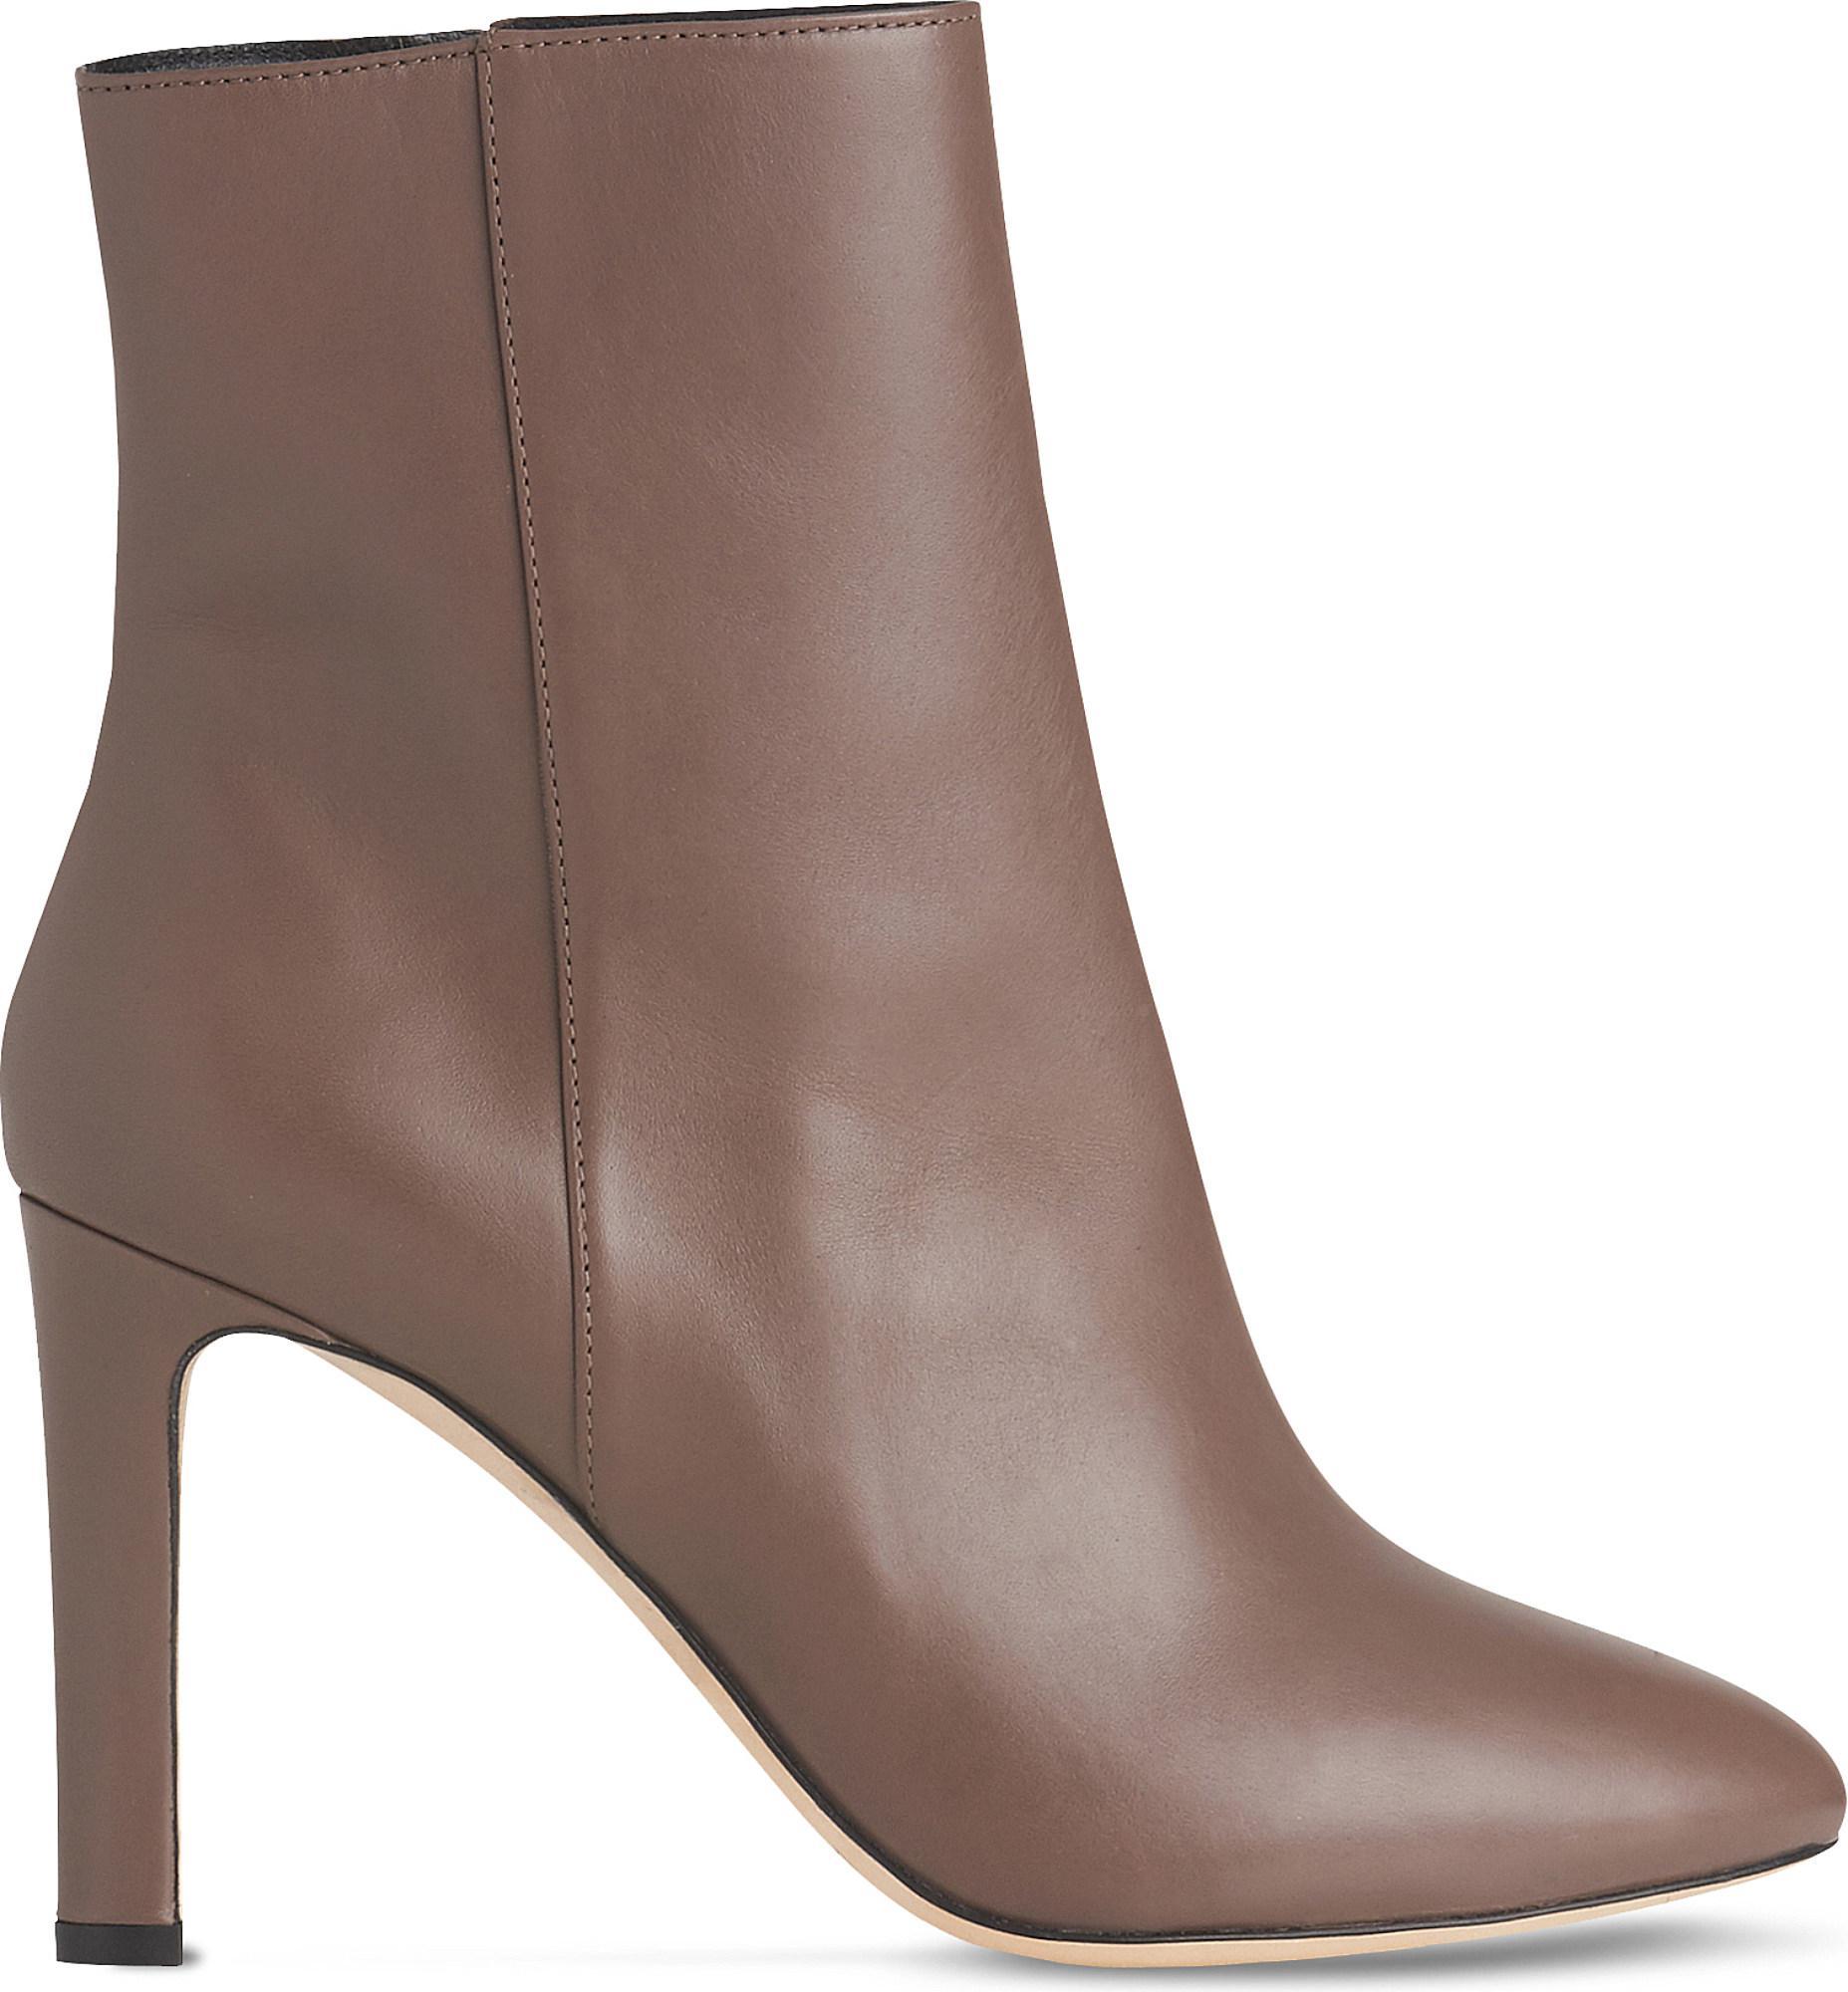 LK Bennett Women's Edelle Boots Excellent Cheap Online Prices Newest uorXF